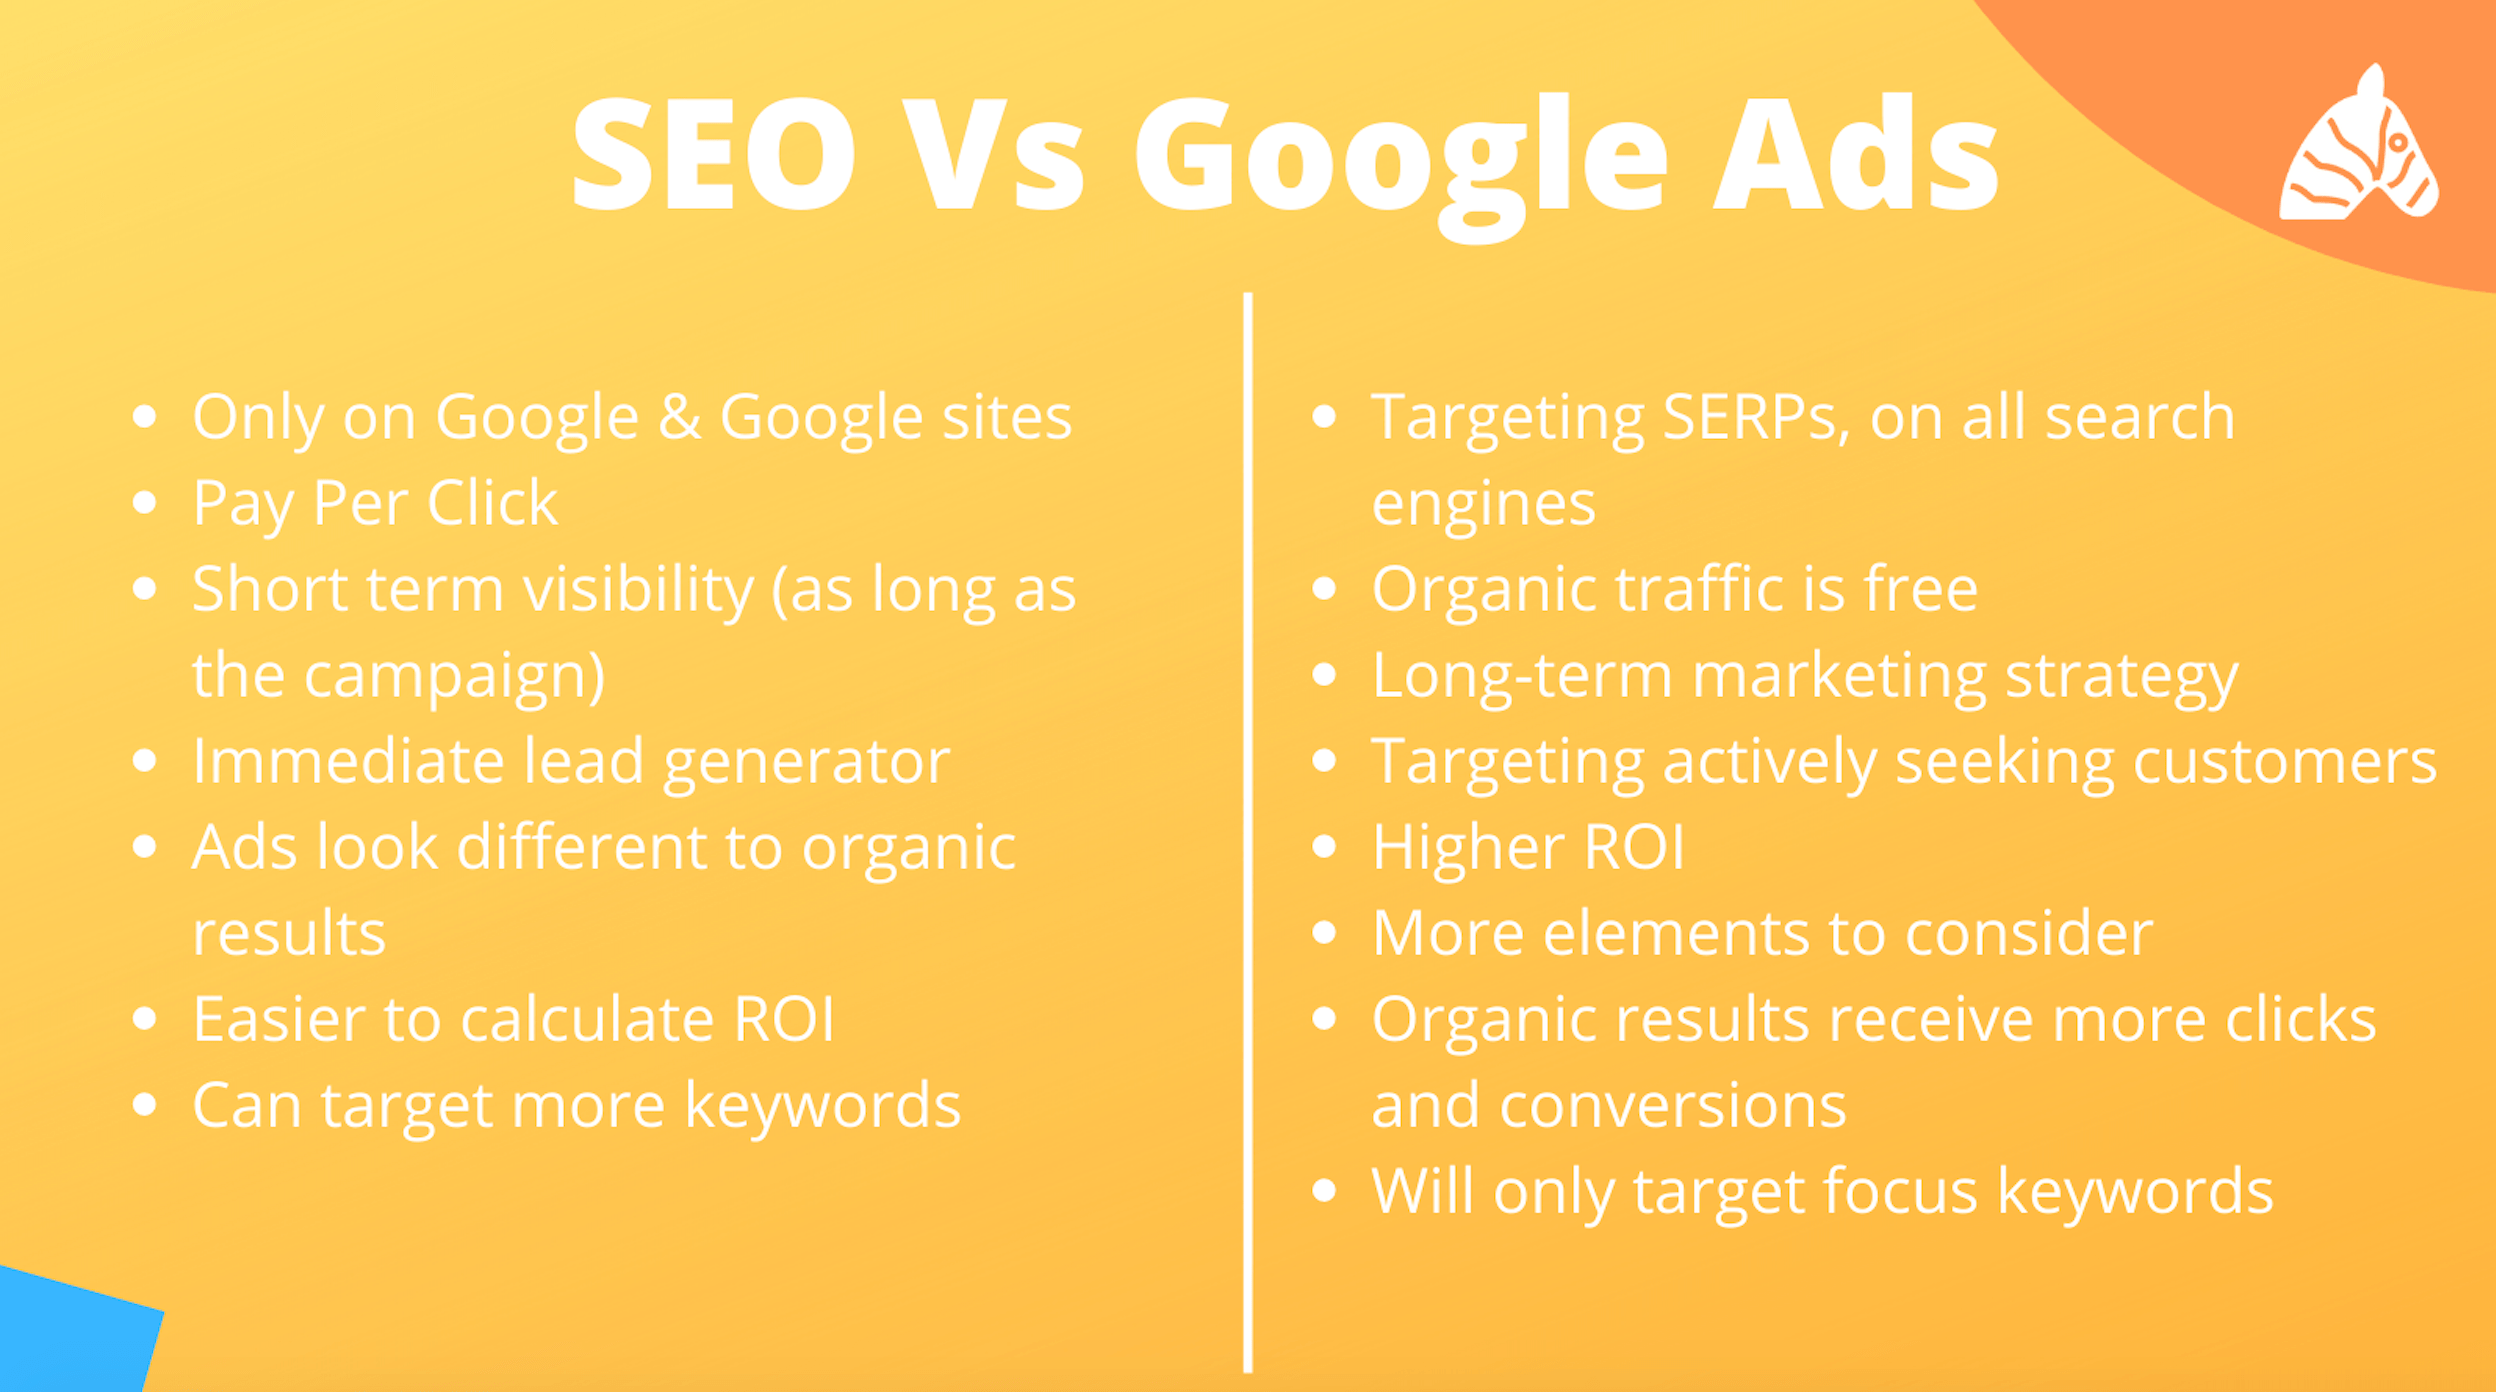 seo vs google ads as a marketing strategy